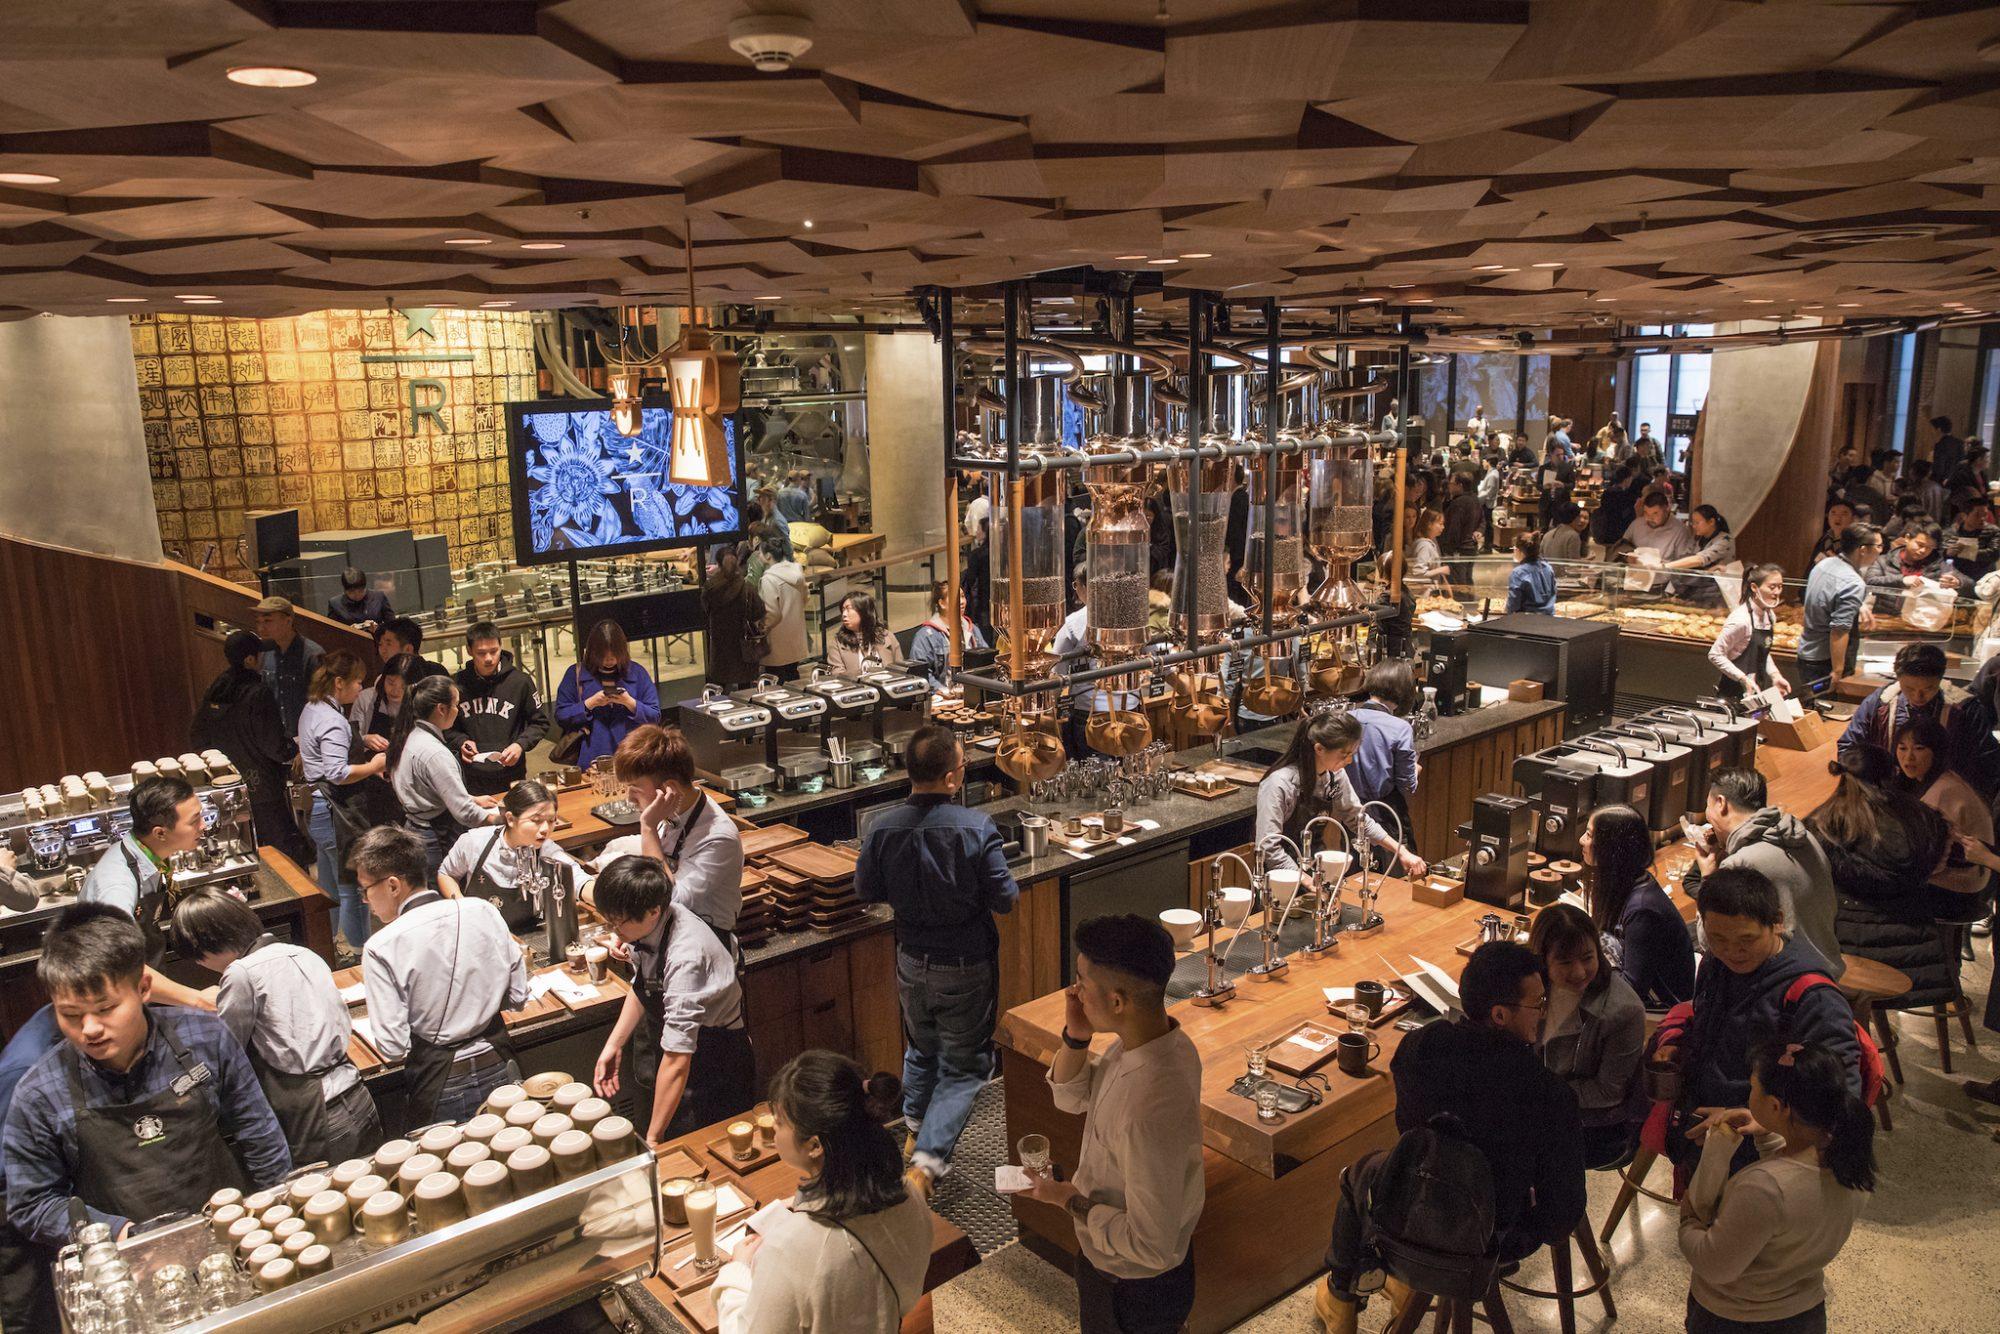 EC: Starbucks' New Shanghai Store Is an Over-the-Top Coffee Wonderland